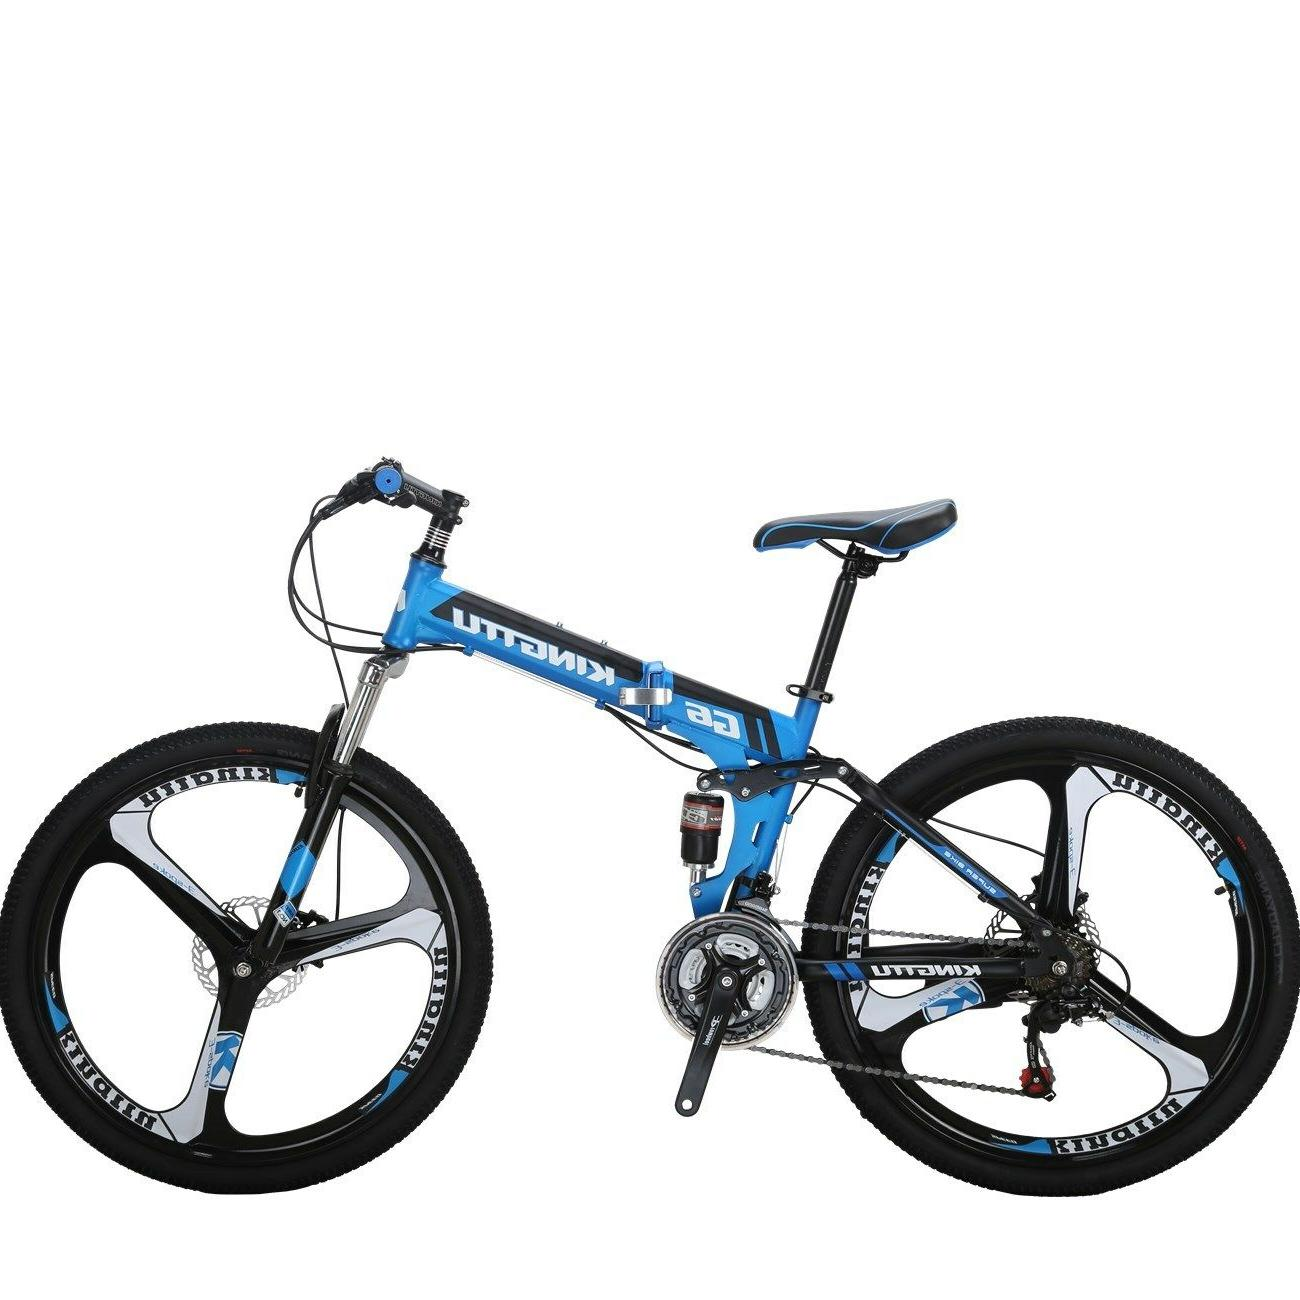 g6 mountain bike 26 3 spoke wheel